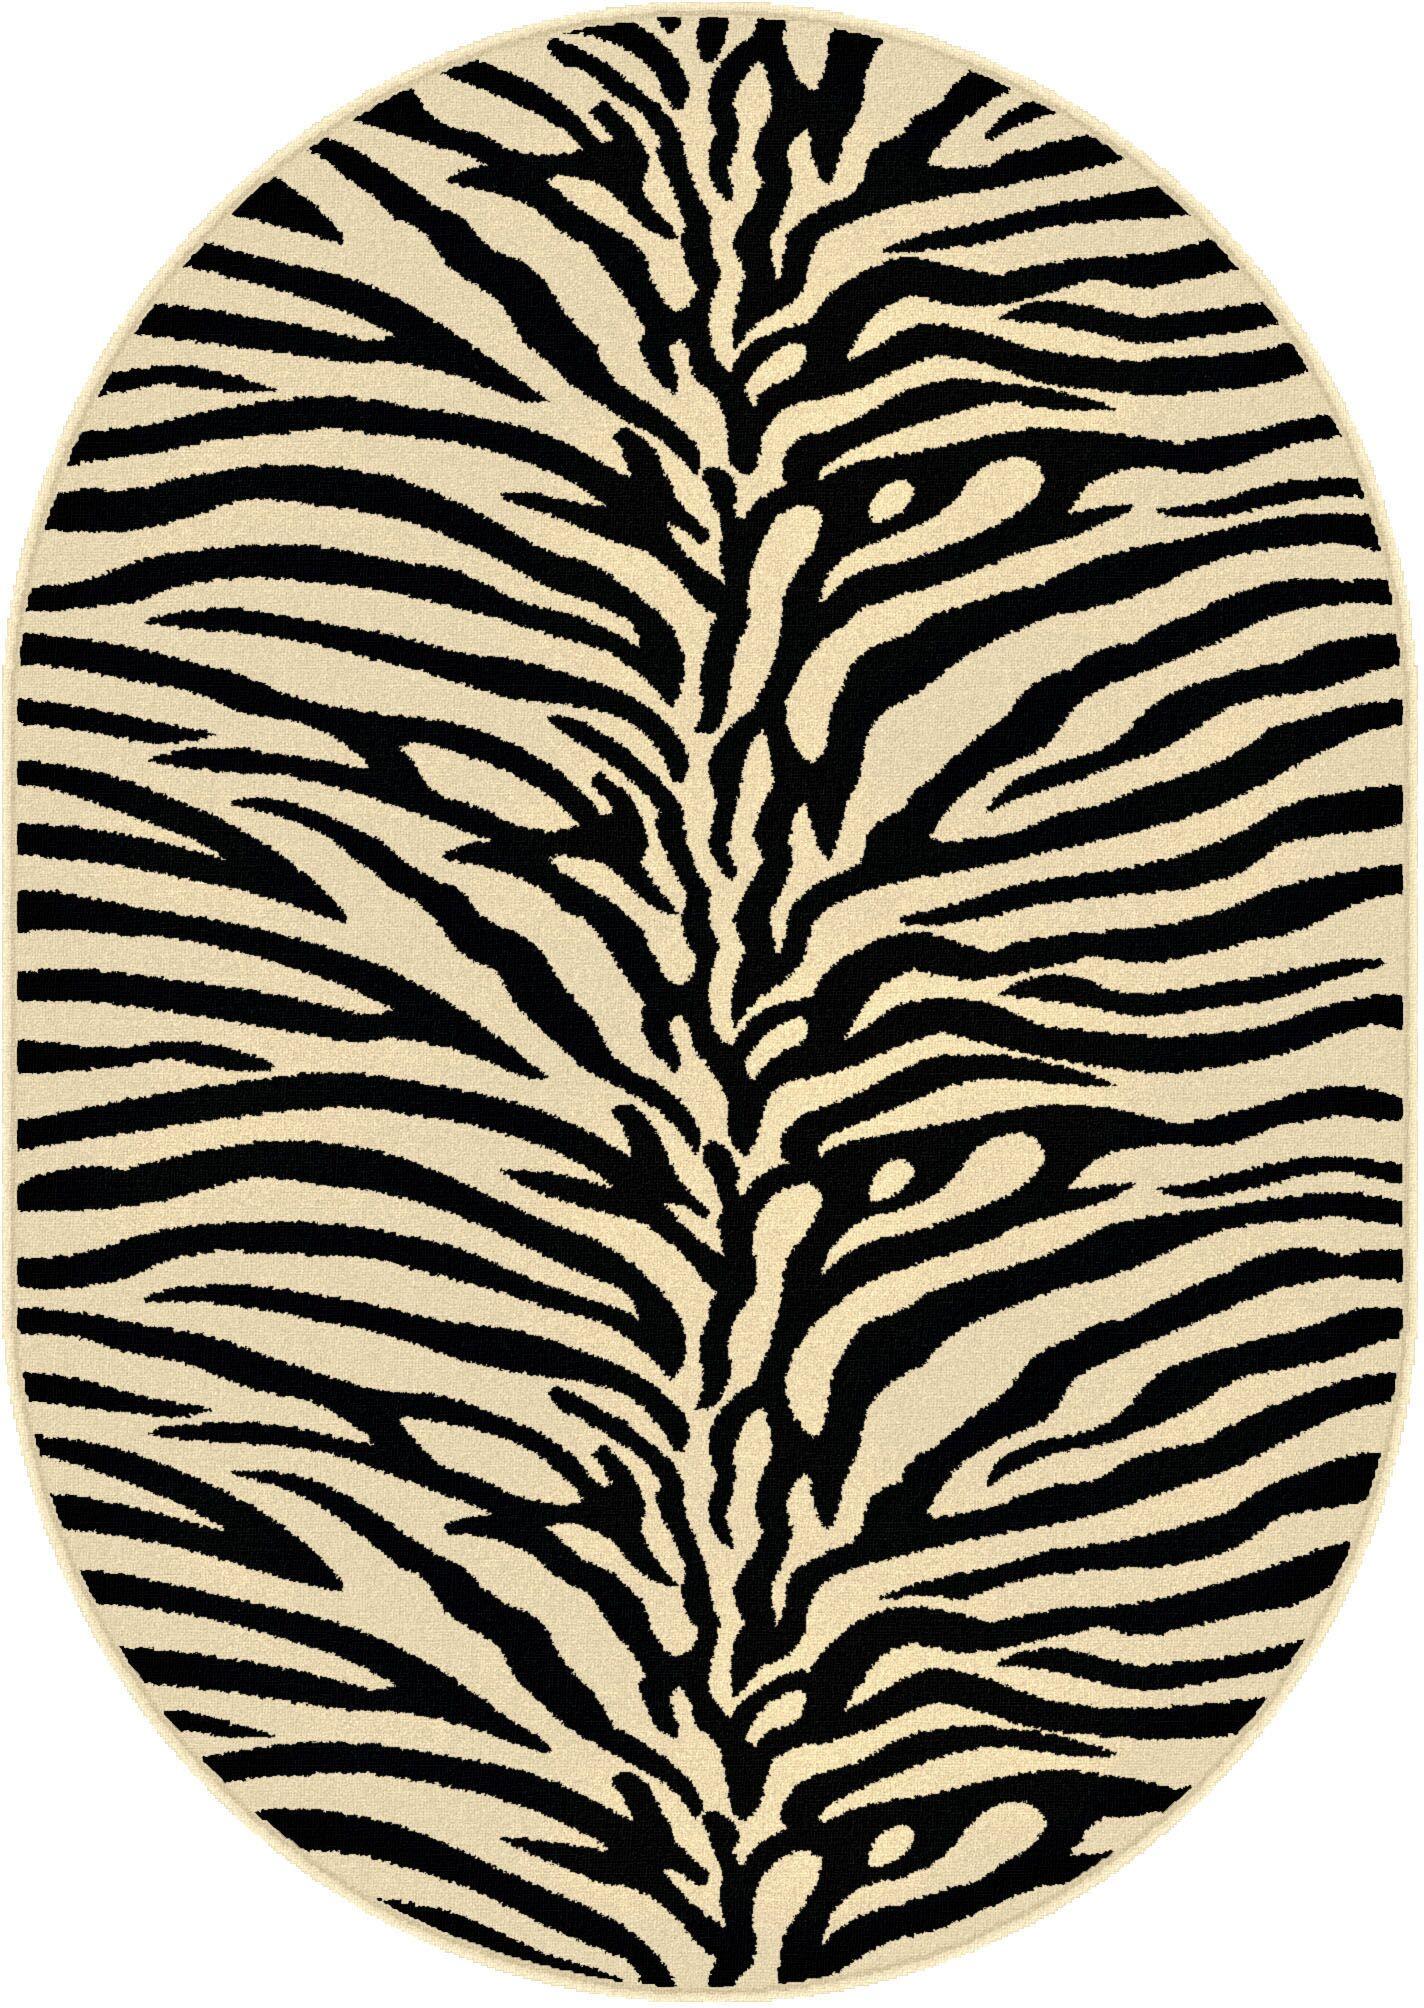 Pembroke Pines Beige Animal Oval Area Rug Rug Size: 6'7'' x 9'6'' Oval